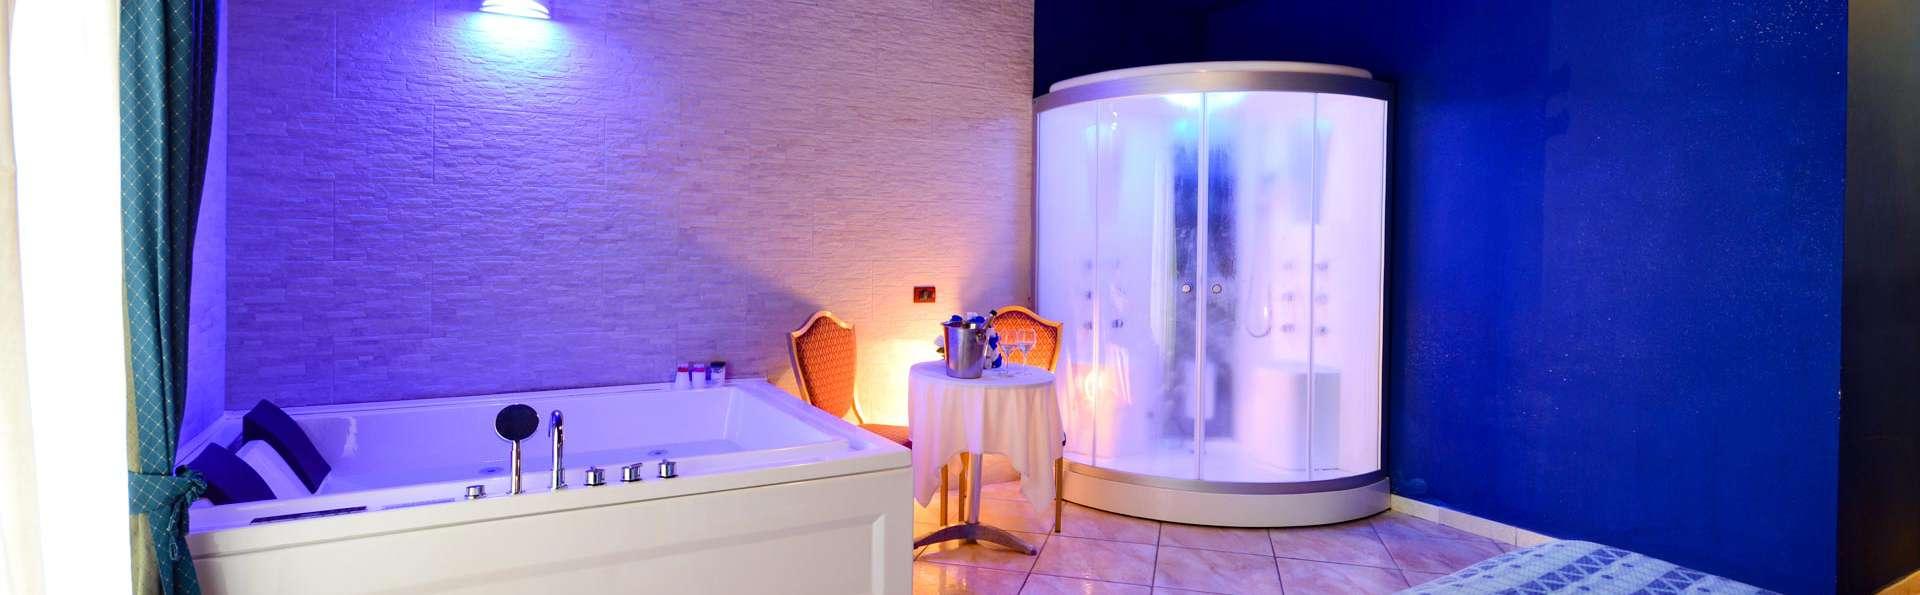 Royal Hotel Montevergine - EDIT_ROOM_15.jpg